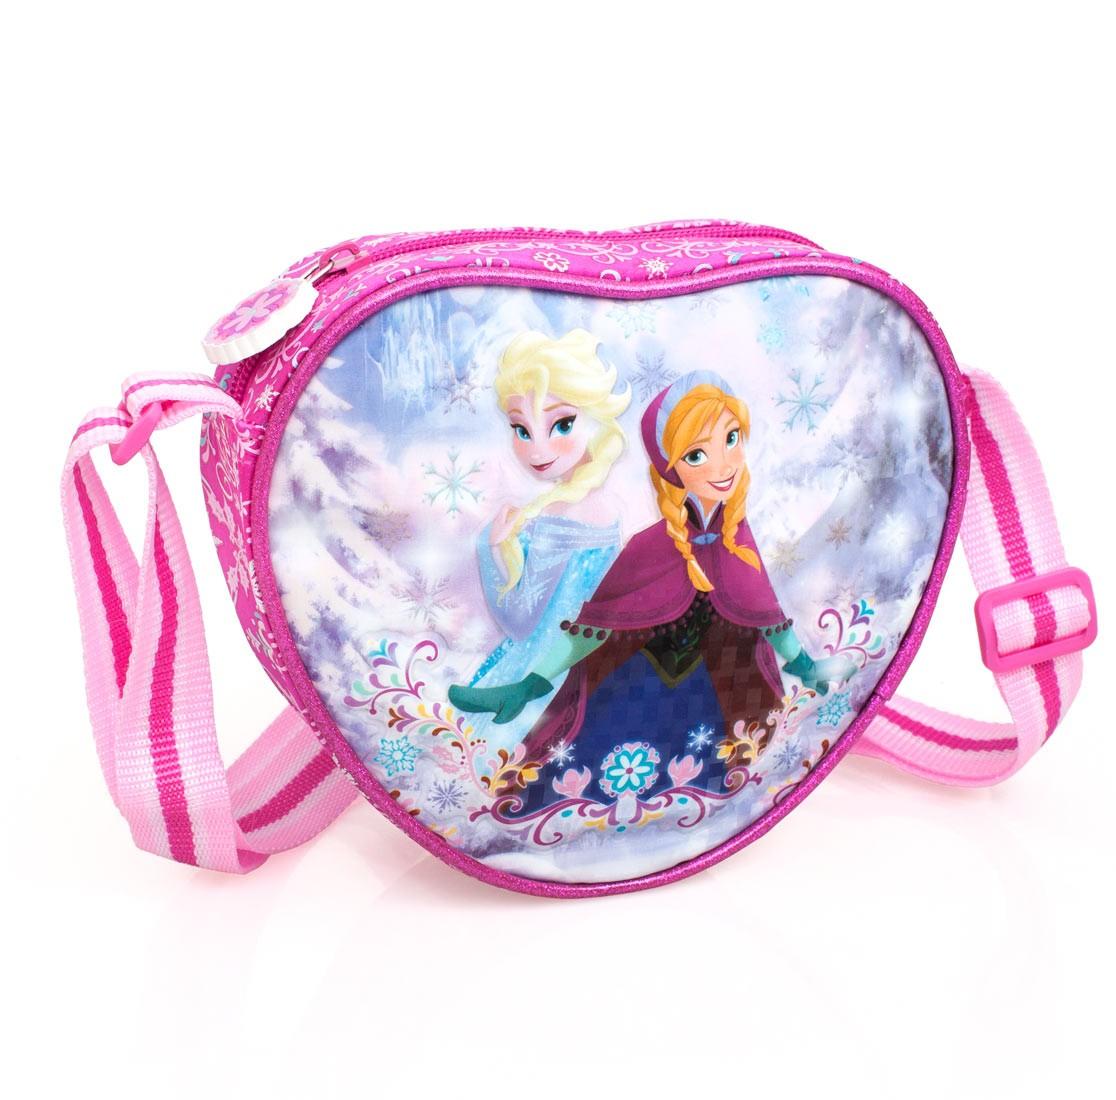 Premium Disney Frozen Heart Shaped Shoulder Bag